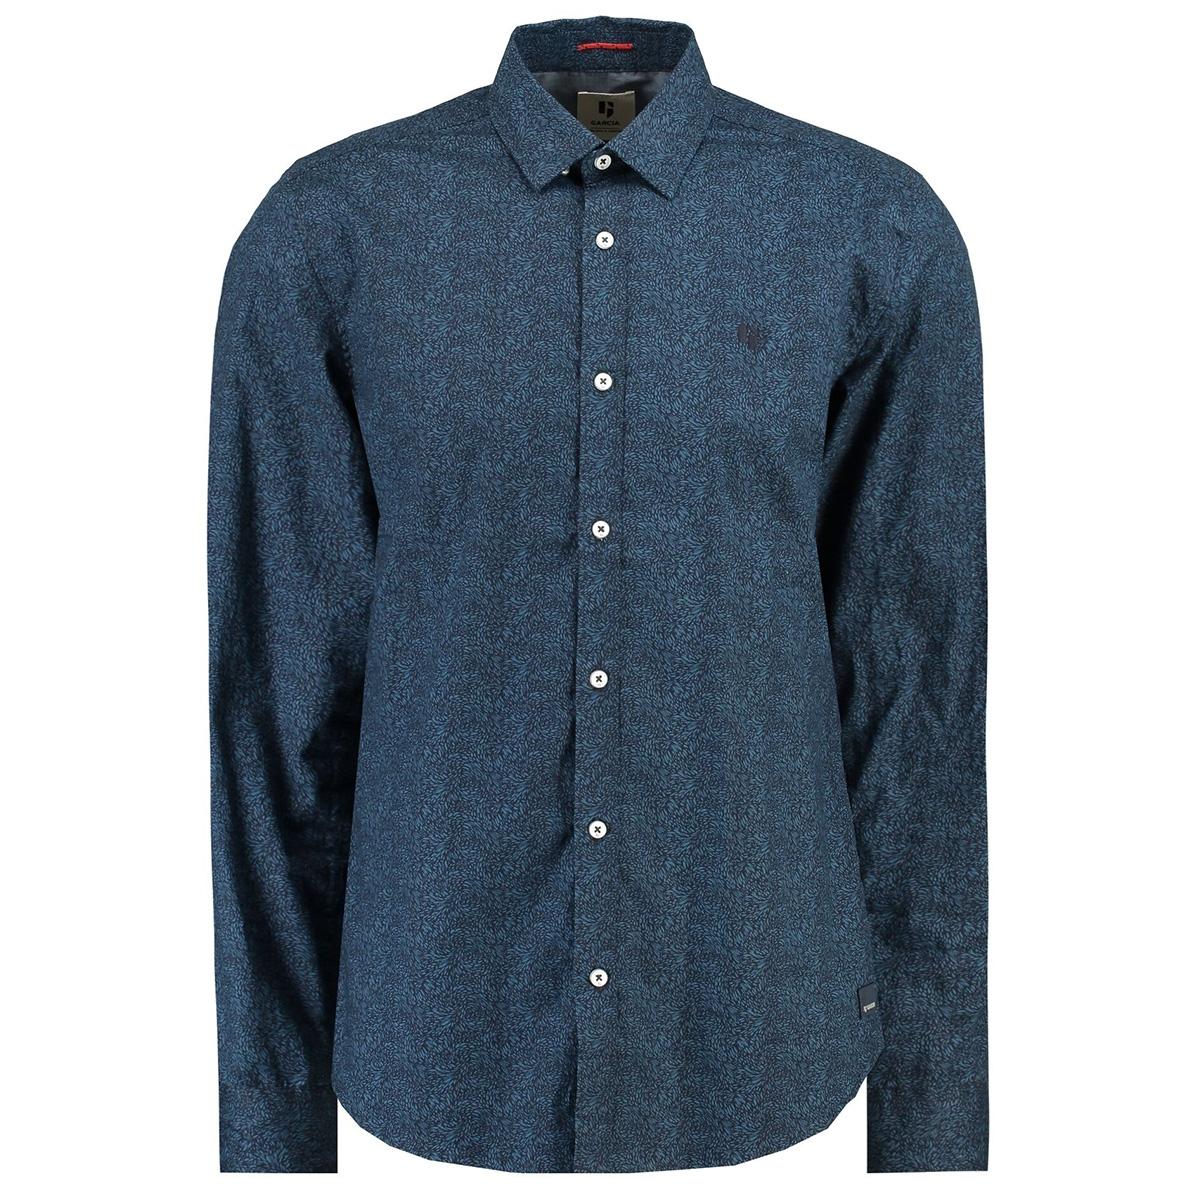 overhemd i91021 garcia overhemd 292 dark moon